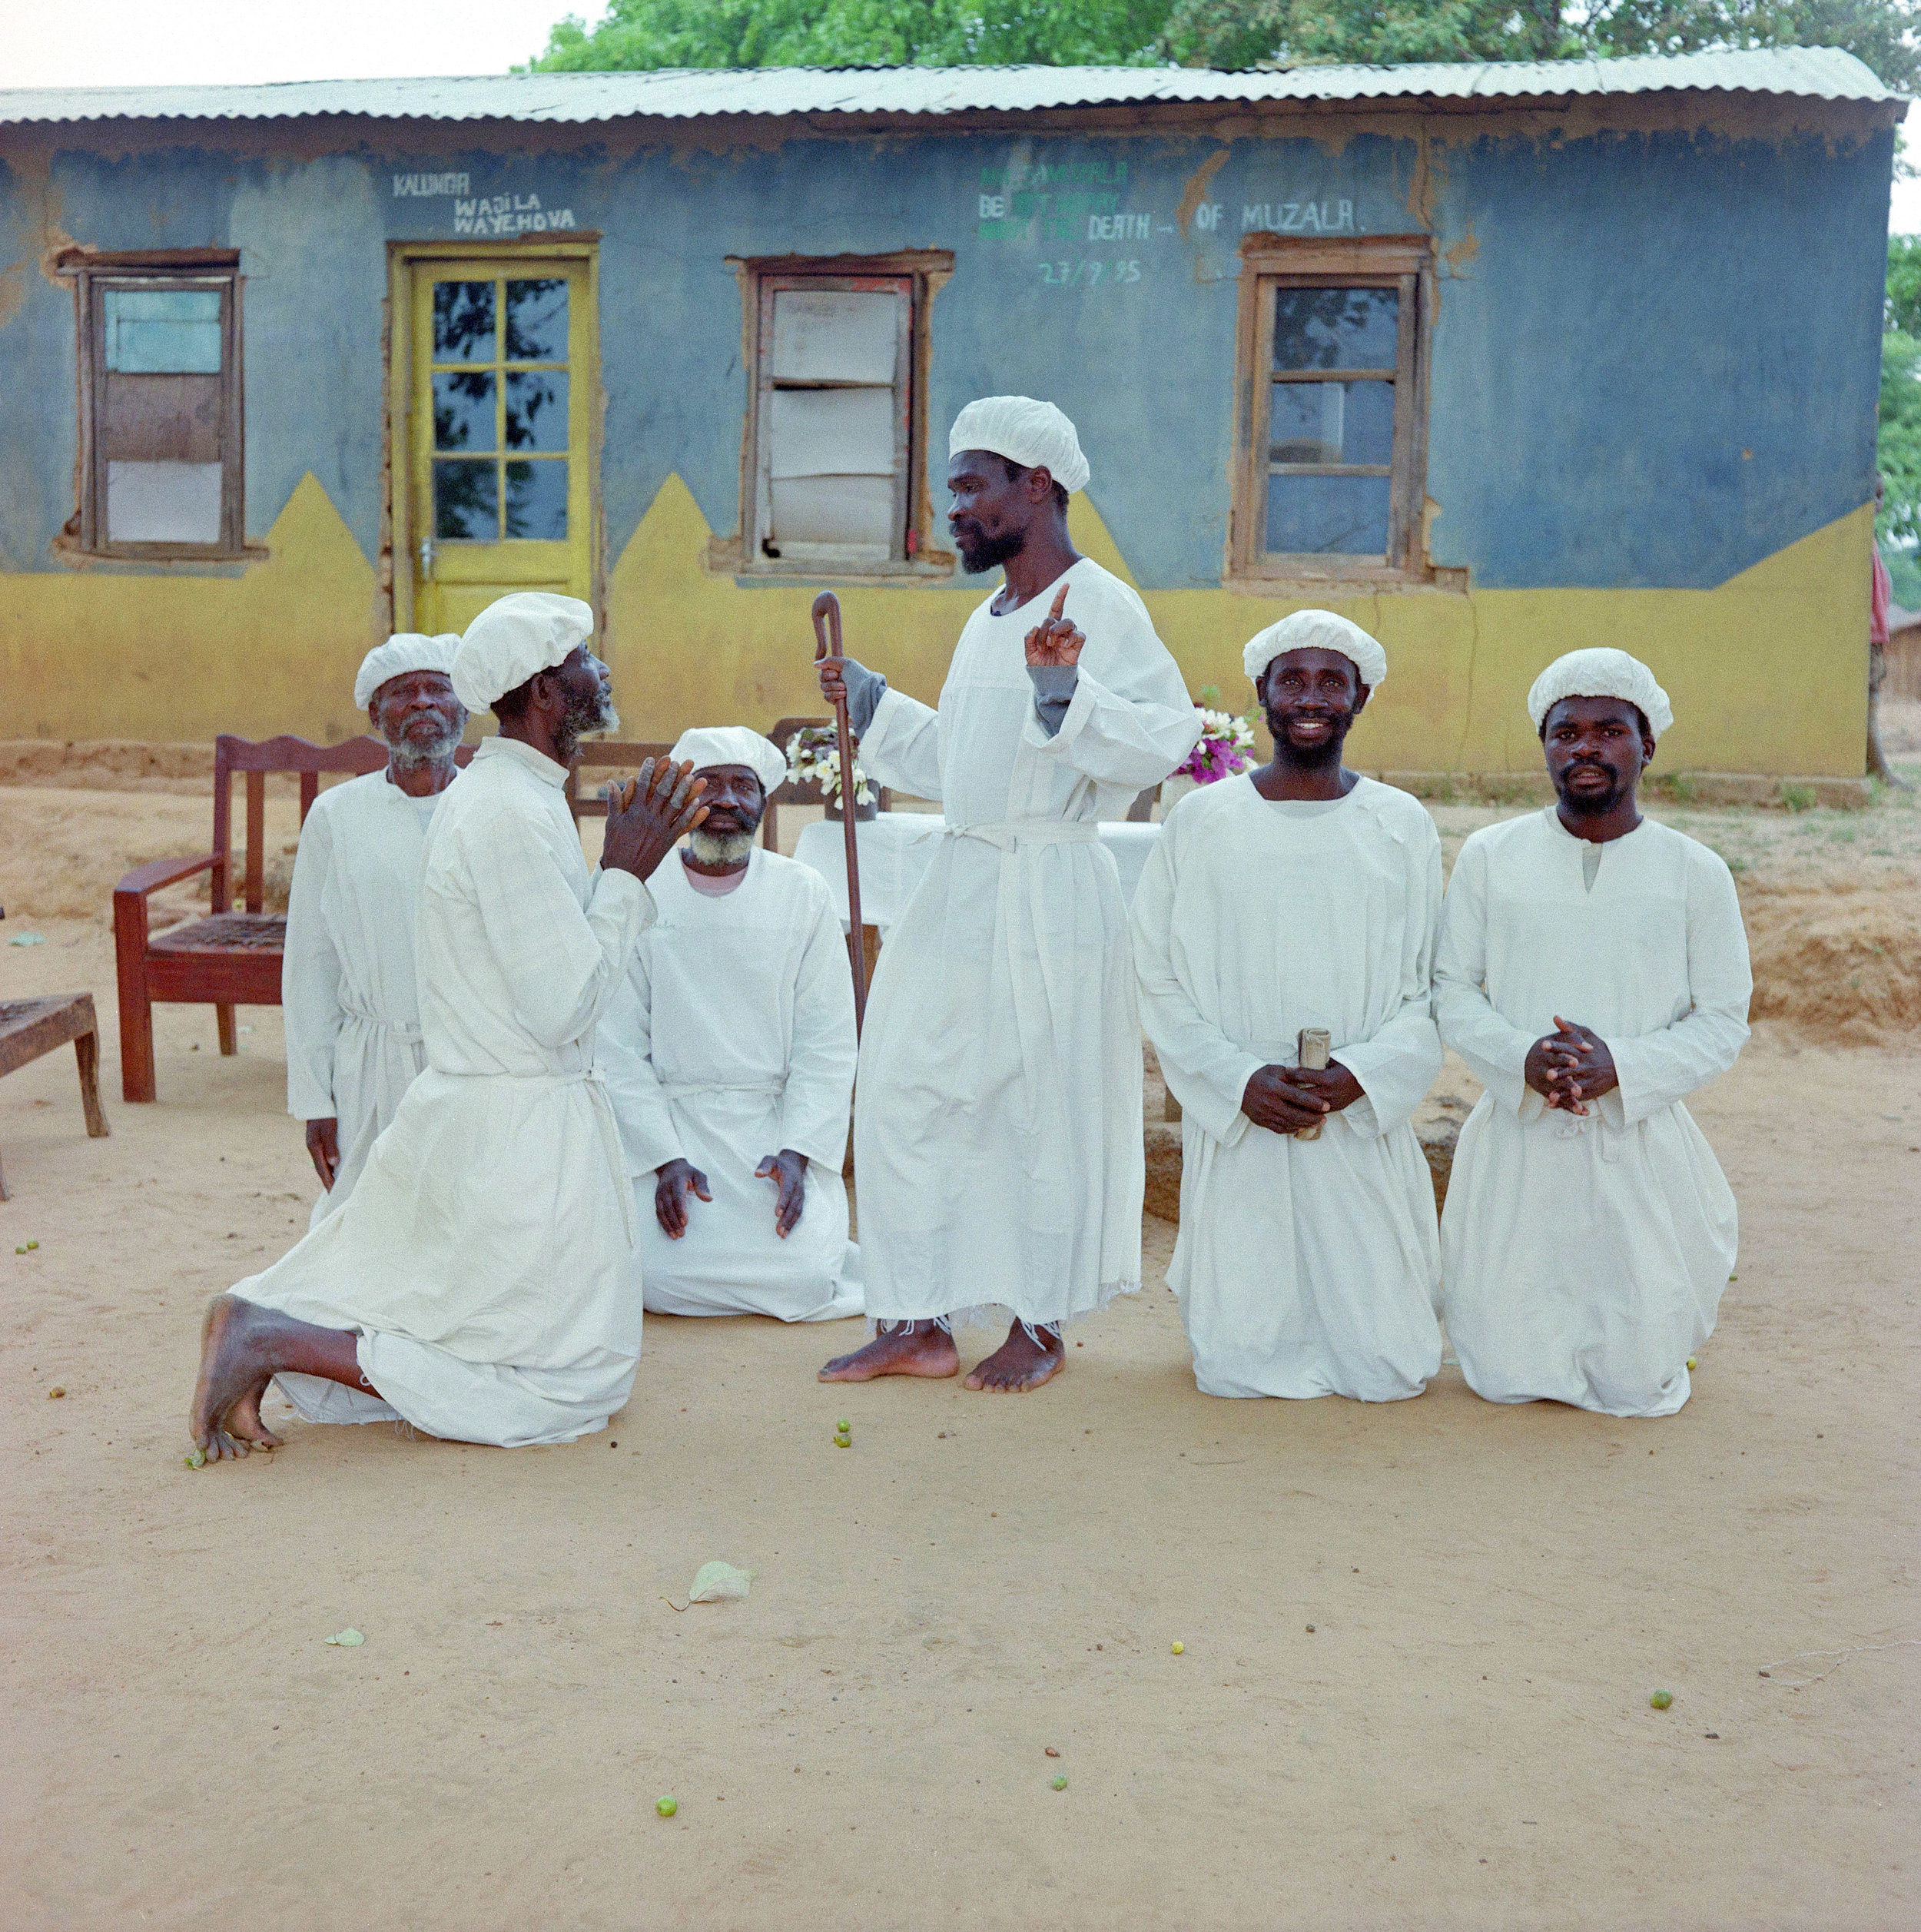 Jesus Christ of Chingala et ses disciples (1997)  Boris Wastiau  Zambie, district du Zambèse, Chingalala.  © MEG, Archives photographiques